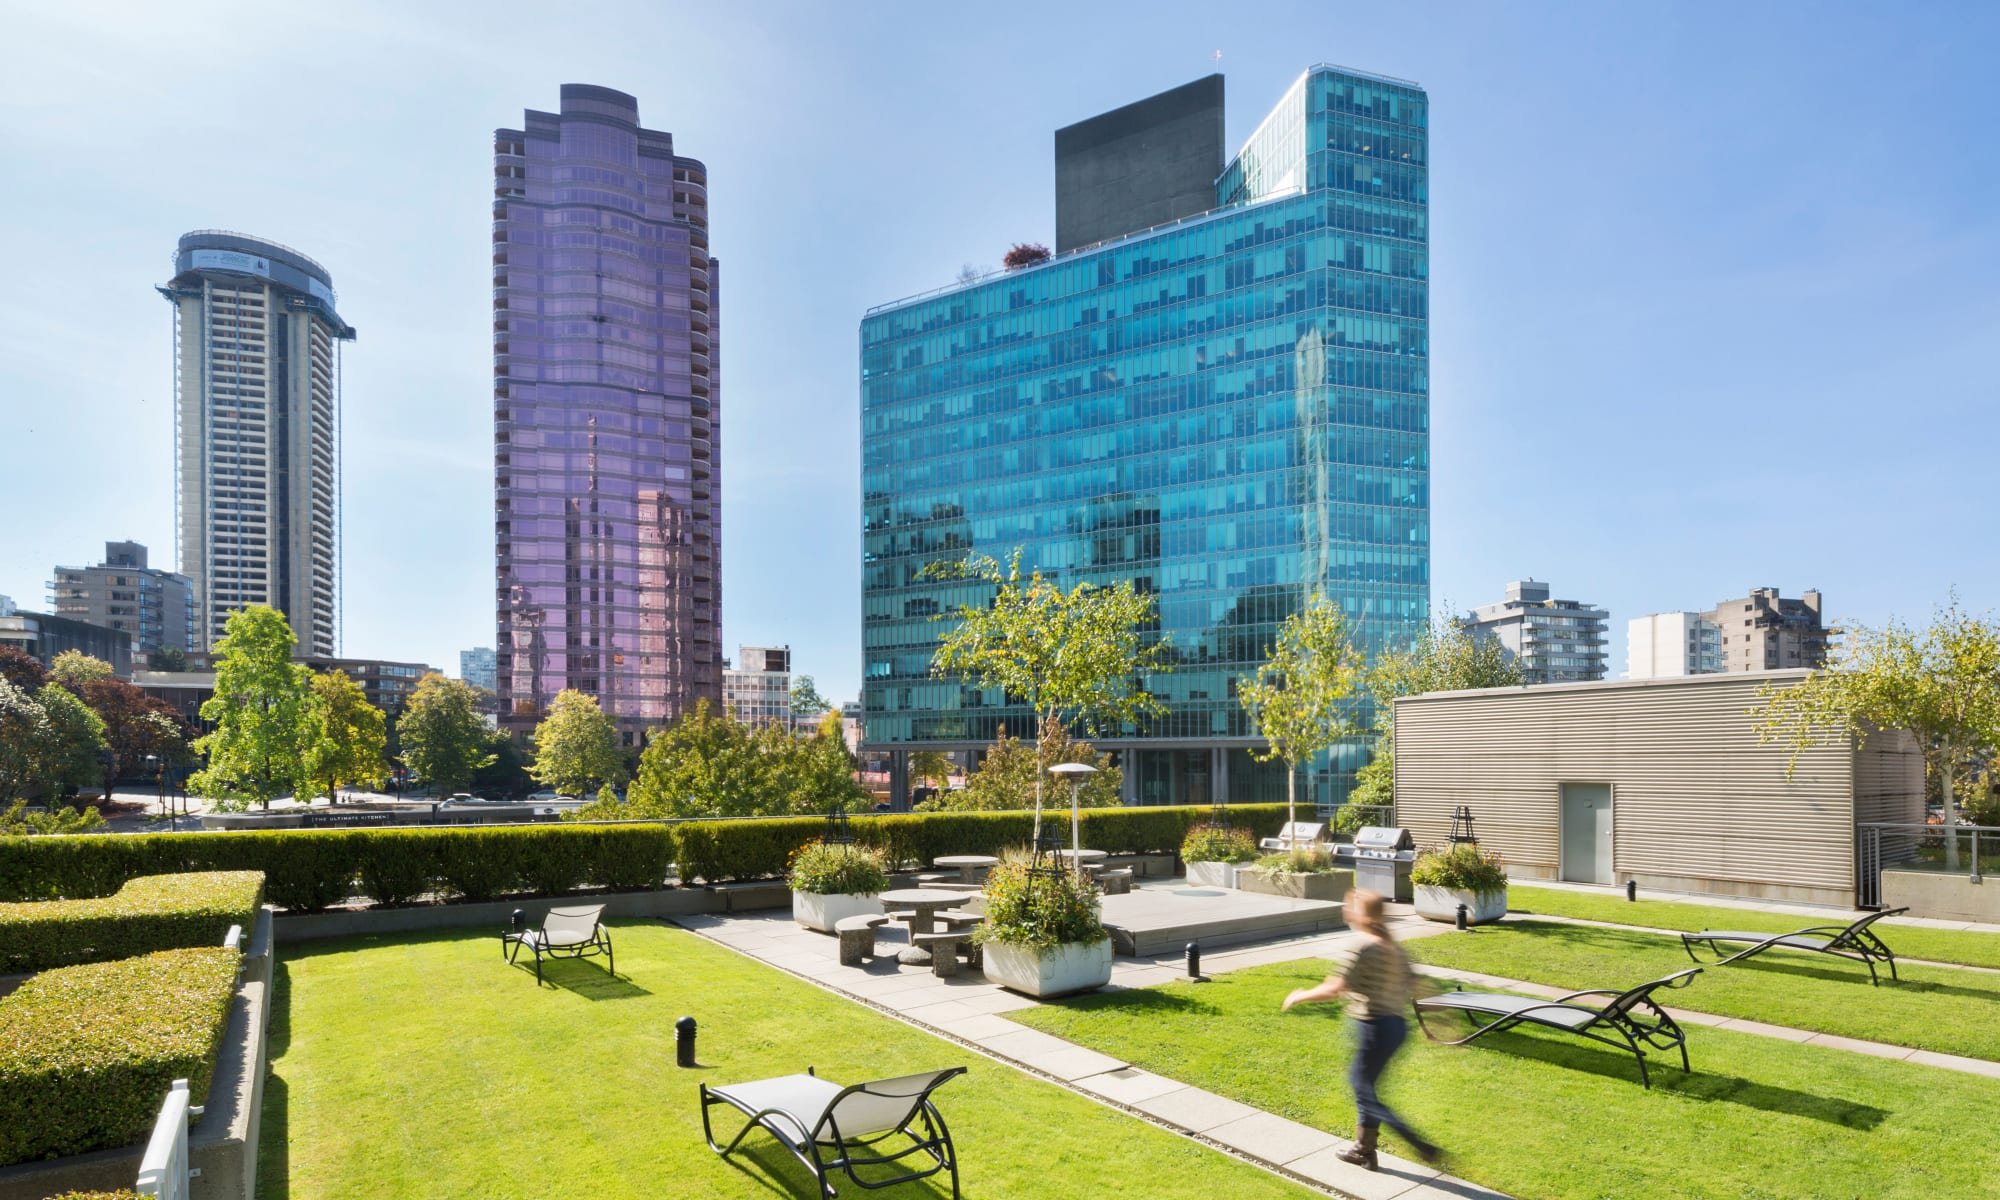 Vancouver, British Columbia apartments at Bayview at Coal Harbour